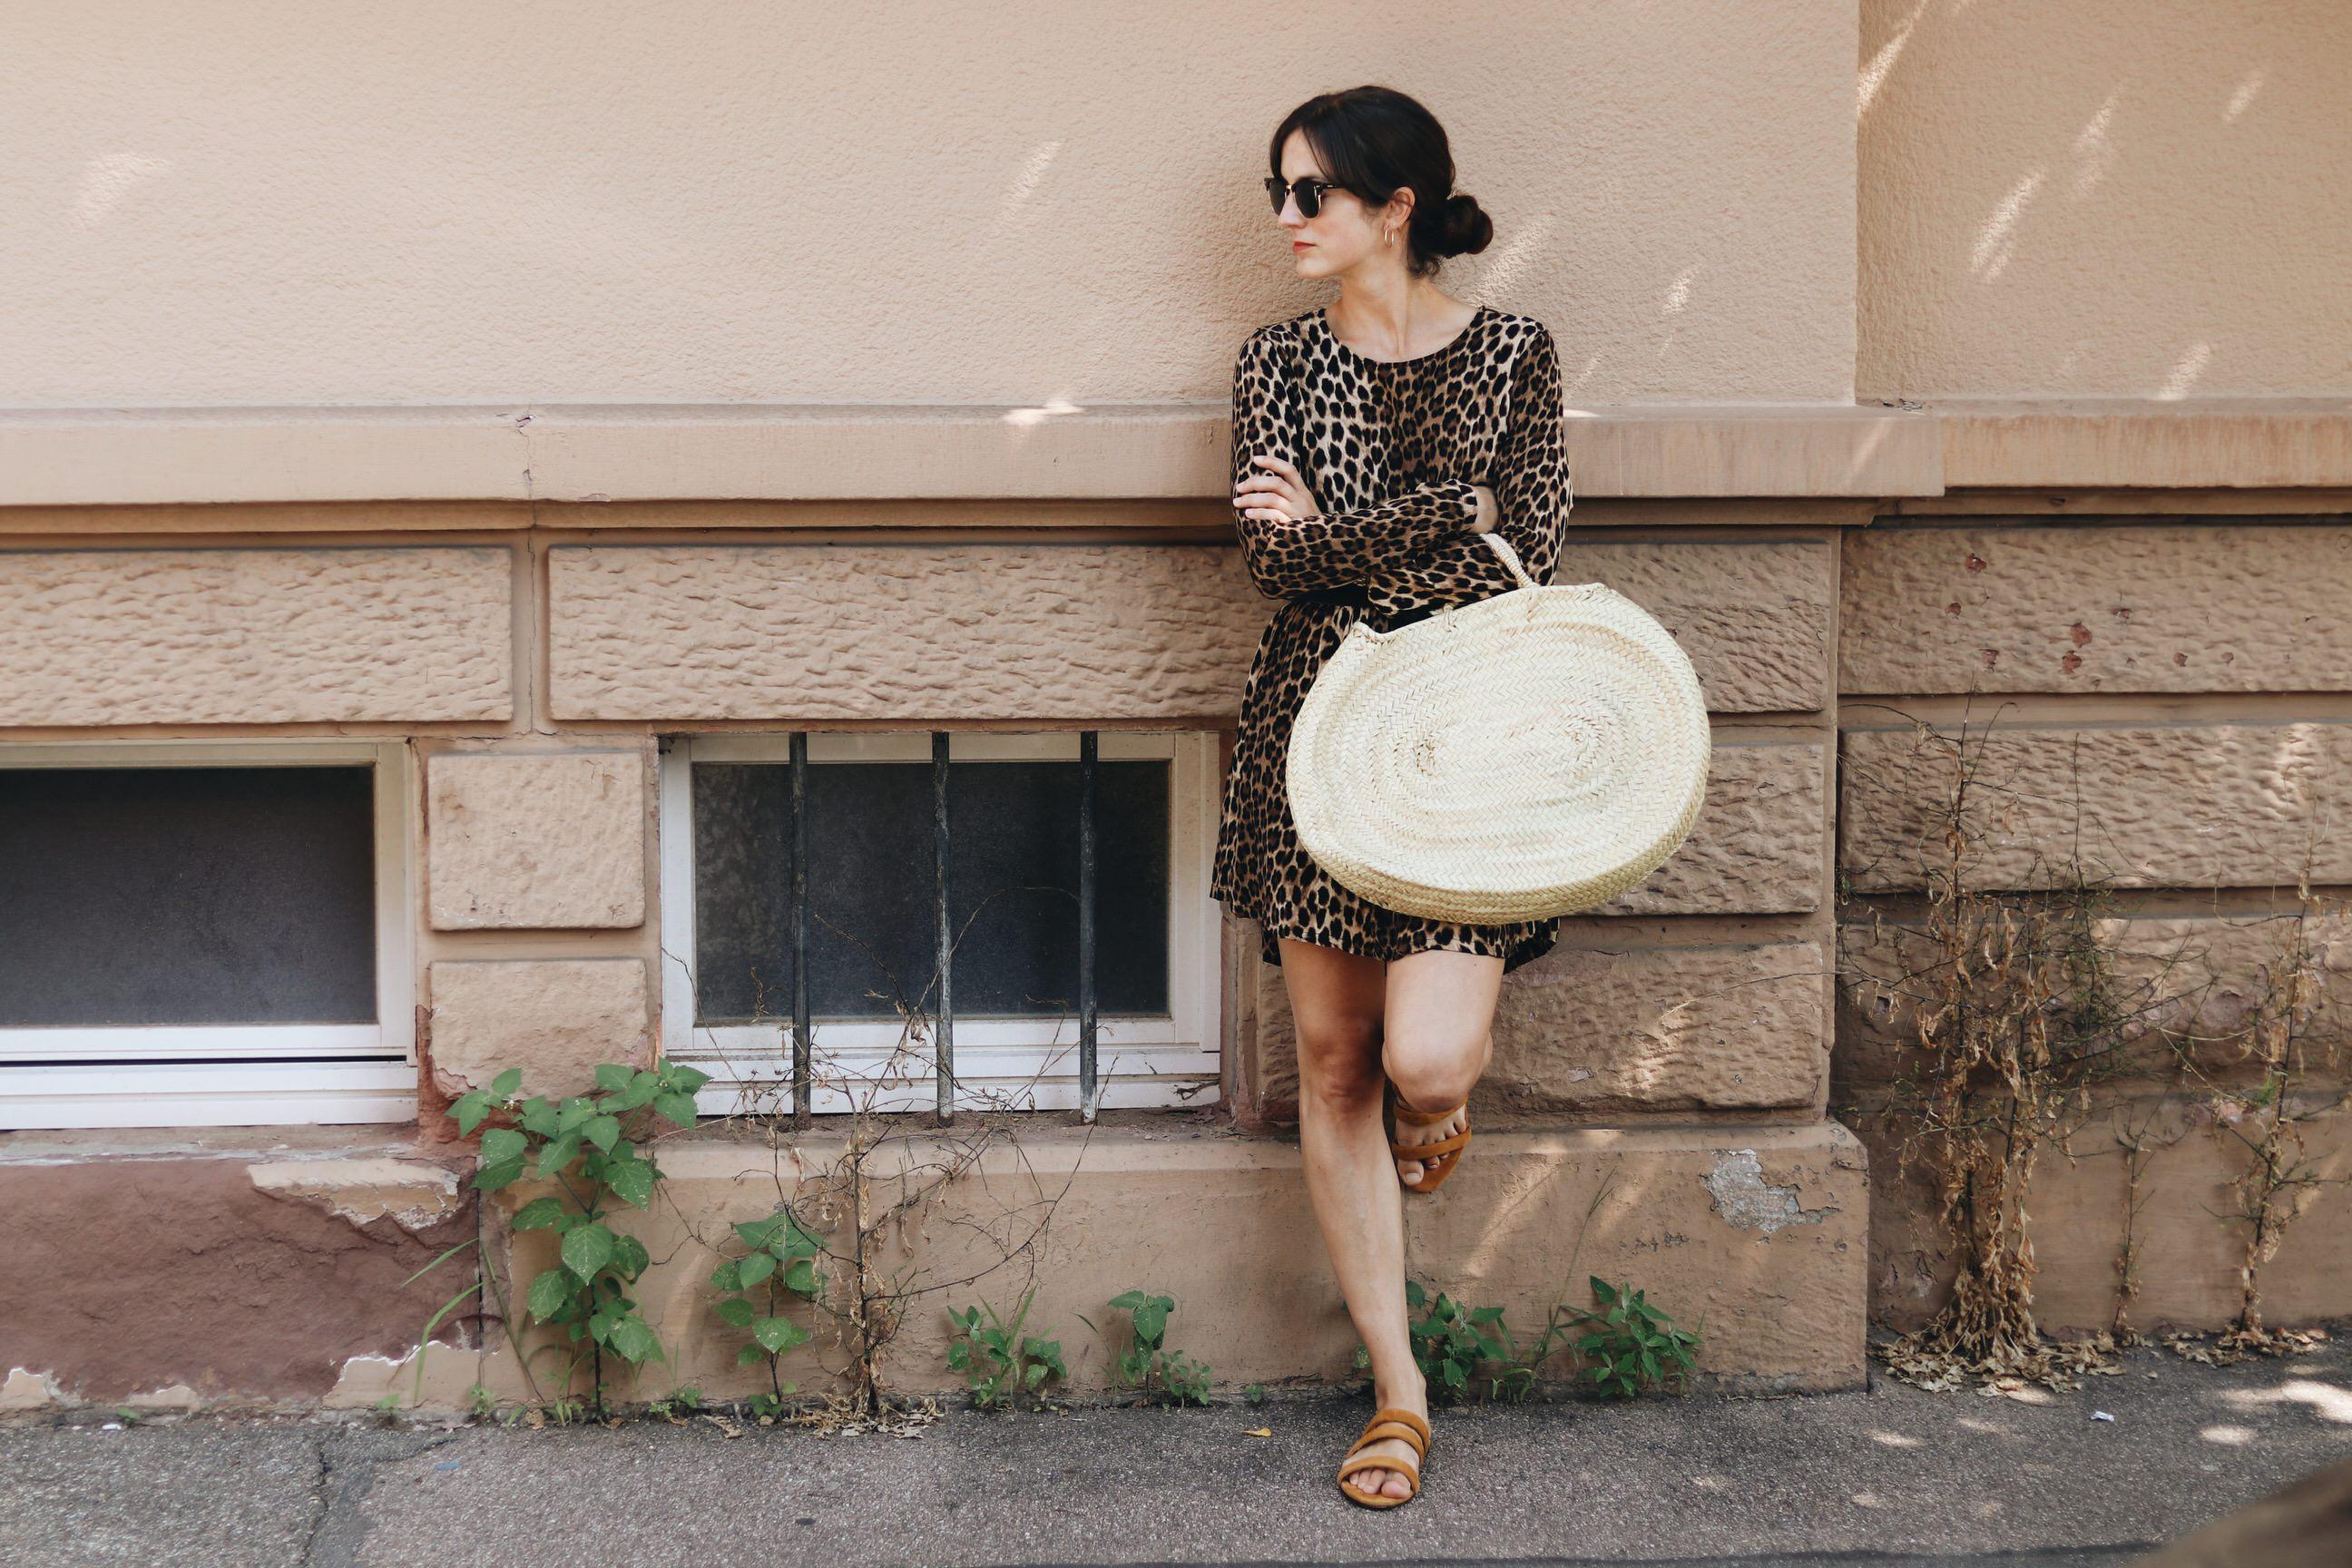 Neele Modebloggerin Modeblog Freiburg deutsch top 10 Sommeroutfit